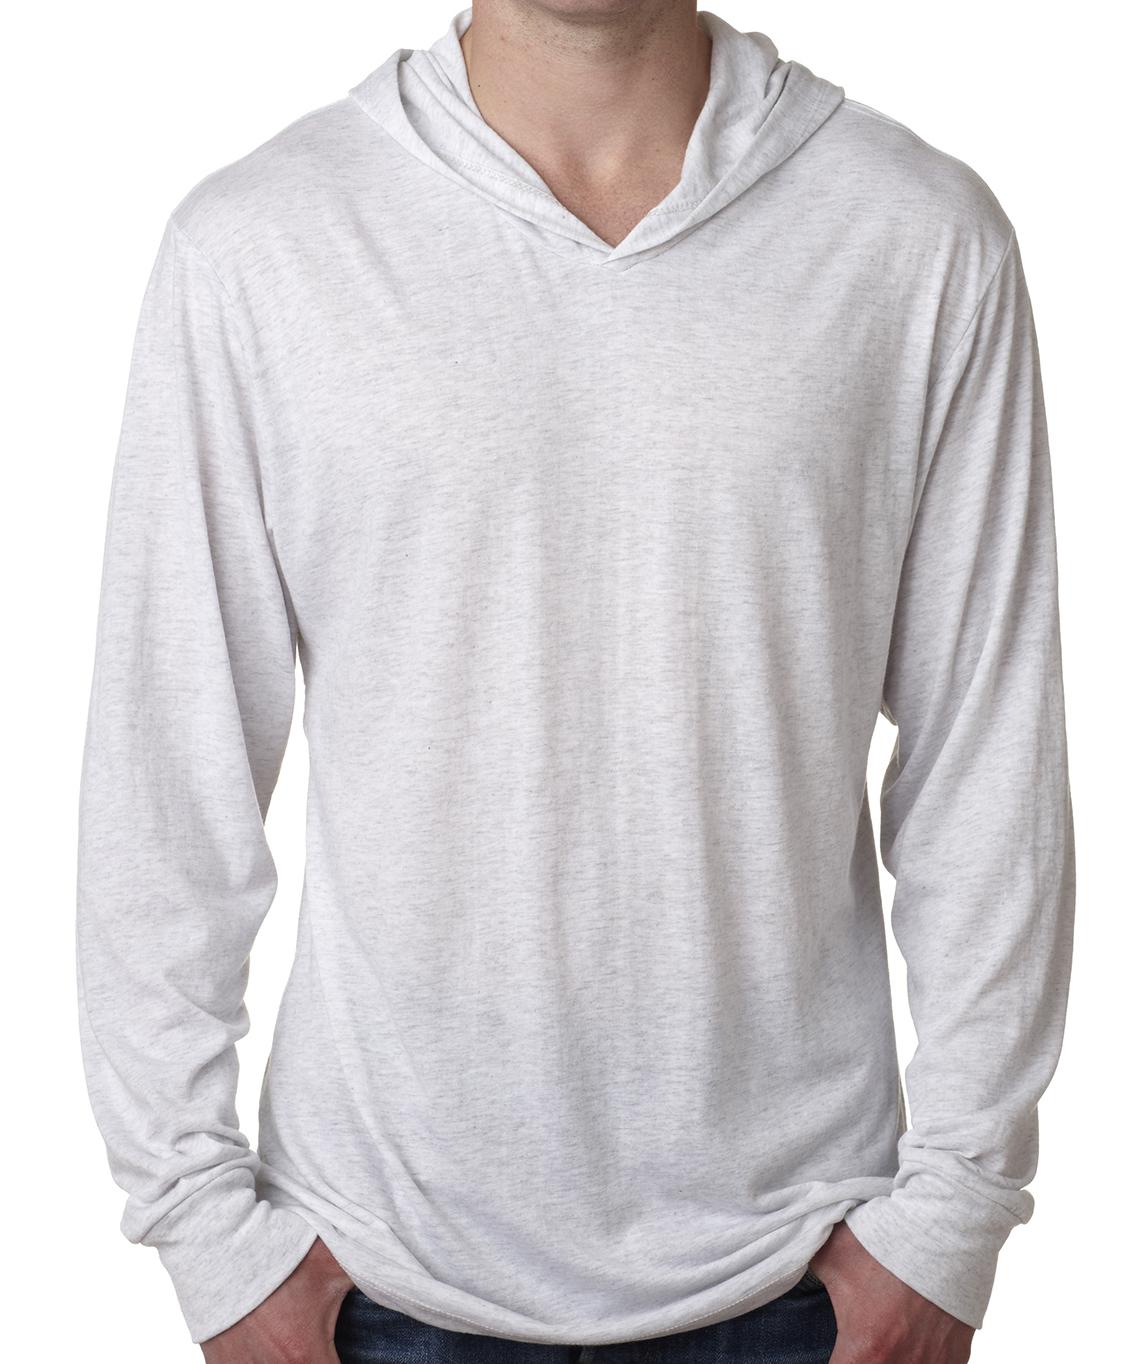 Unisex triblend long sleeve hoodie (cotton, polyester, rayon blend, longer length, super soft feel, $$)